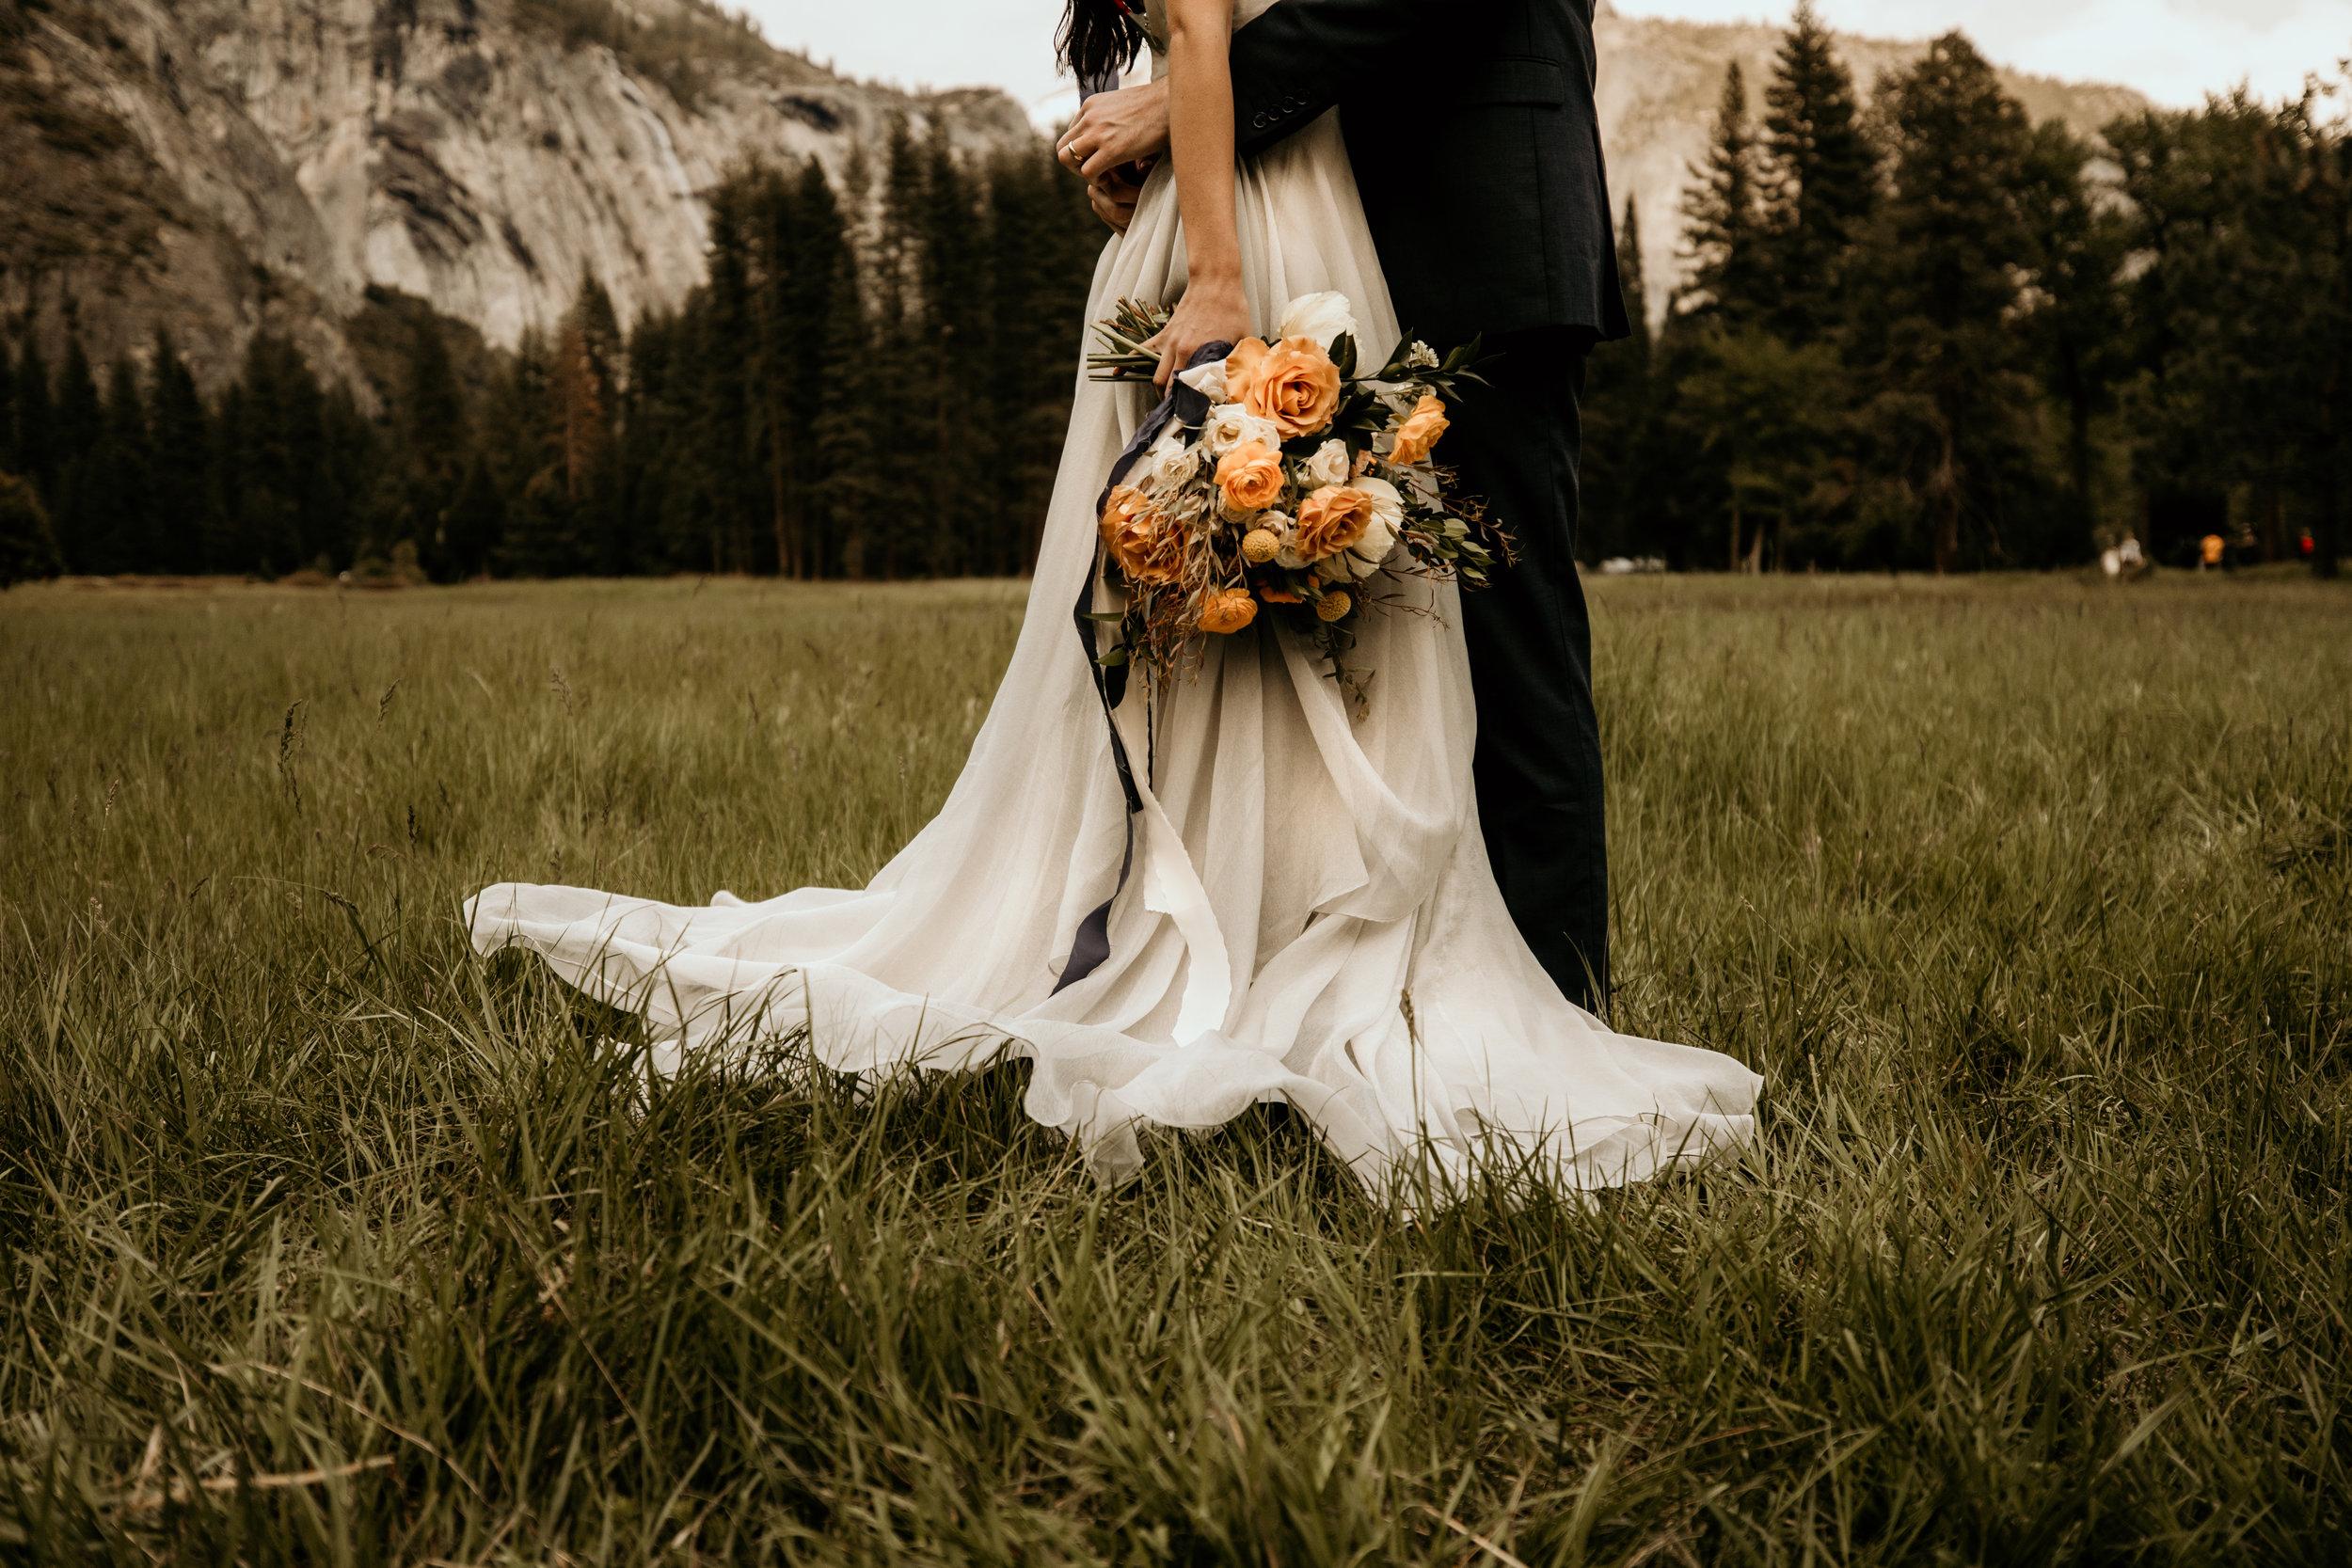 couples-engagement-outdoor-tatoo-photoshoot-little-rock-arkansas-1062.jpg